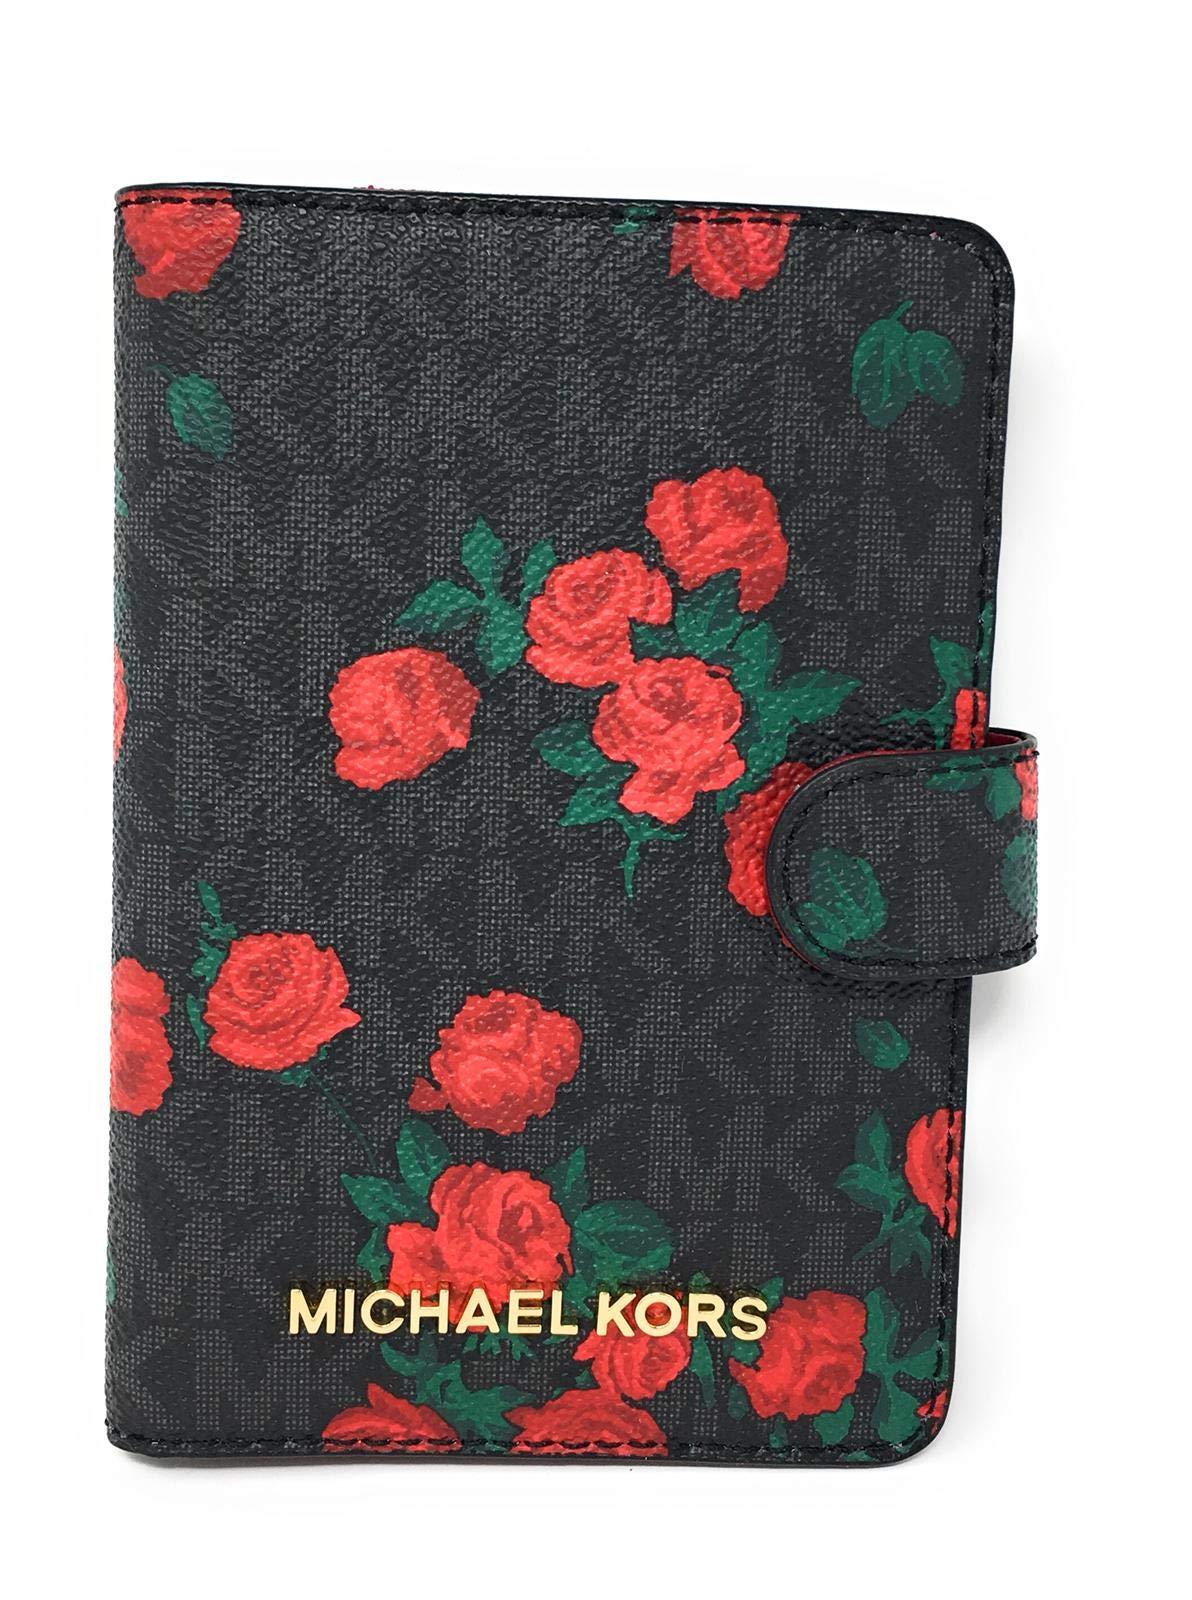 Michael Kors Jet Set Travel Passport Case Wallet (Black PVC Flowers)